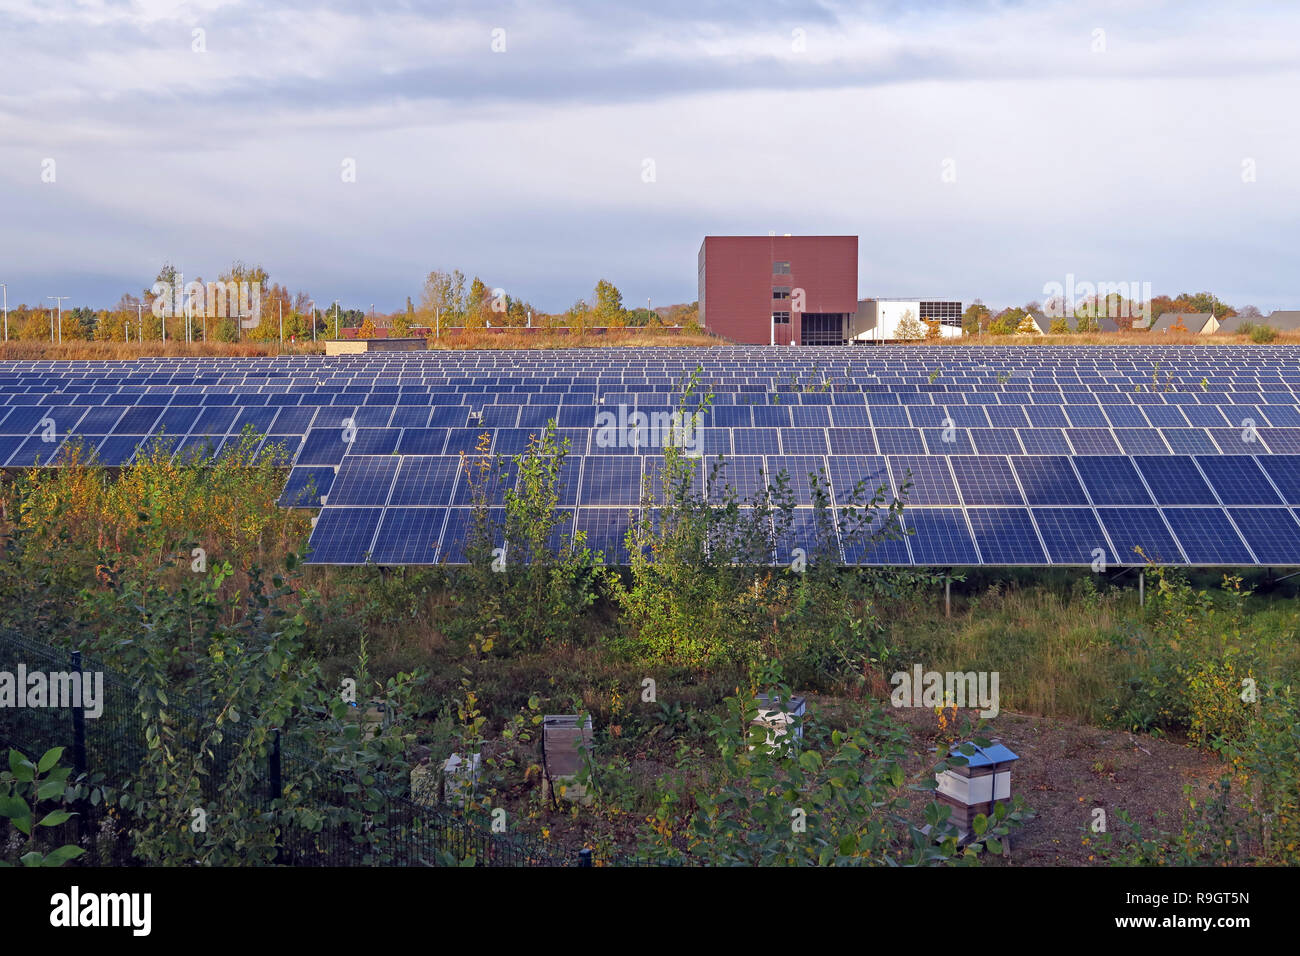 GoTonySmith,@HotpixUK,HotpixUK,Solar,Panel,Solar Panels,Dalkeith,Lothian,Scotland,UK,Eco,ecological,renewable,energy,Solar Farm,electricity,power,carbon-free,carbon neutral,carbon free,solar pv,farm,meadow,field,power generation,Scottish,EH22,Scottish PV,Scotland Solar Power,generating electricity,from solar,photo-voltaic panels,SSE,Scottish Southern Energy,Steve Tinsley,Green Deal,Energy,Solutions,going green,green energy